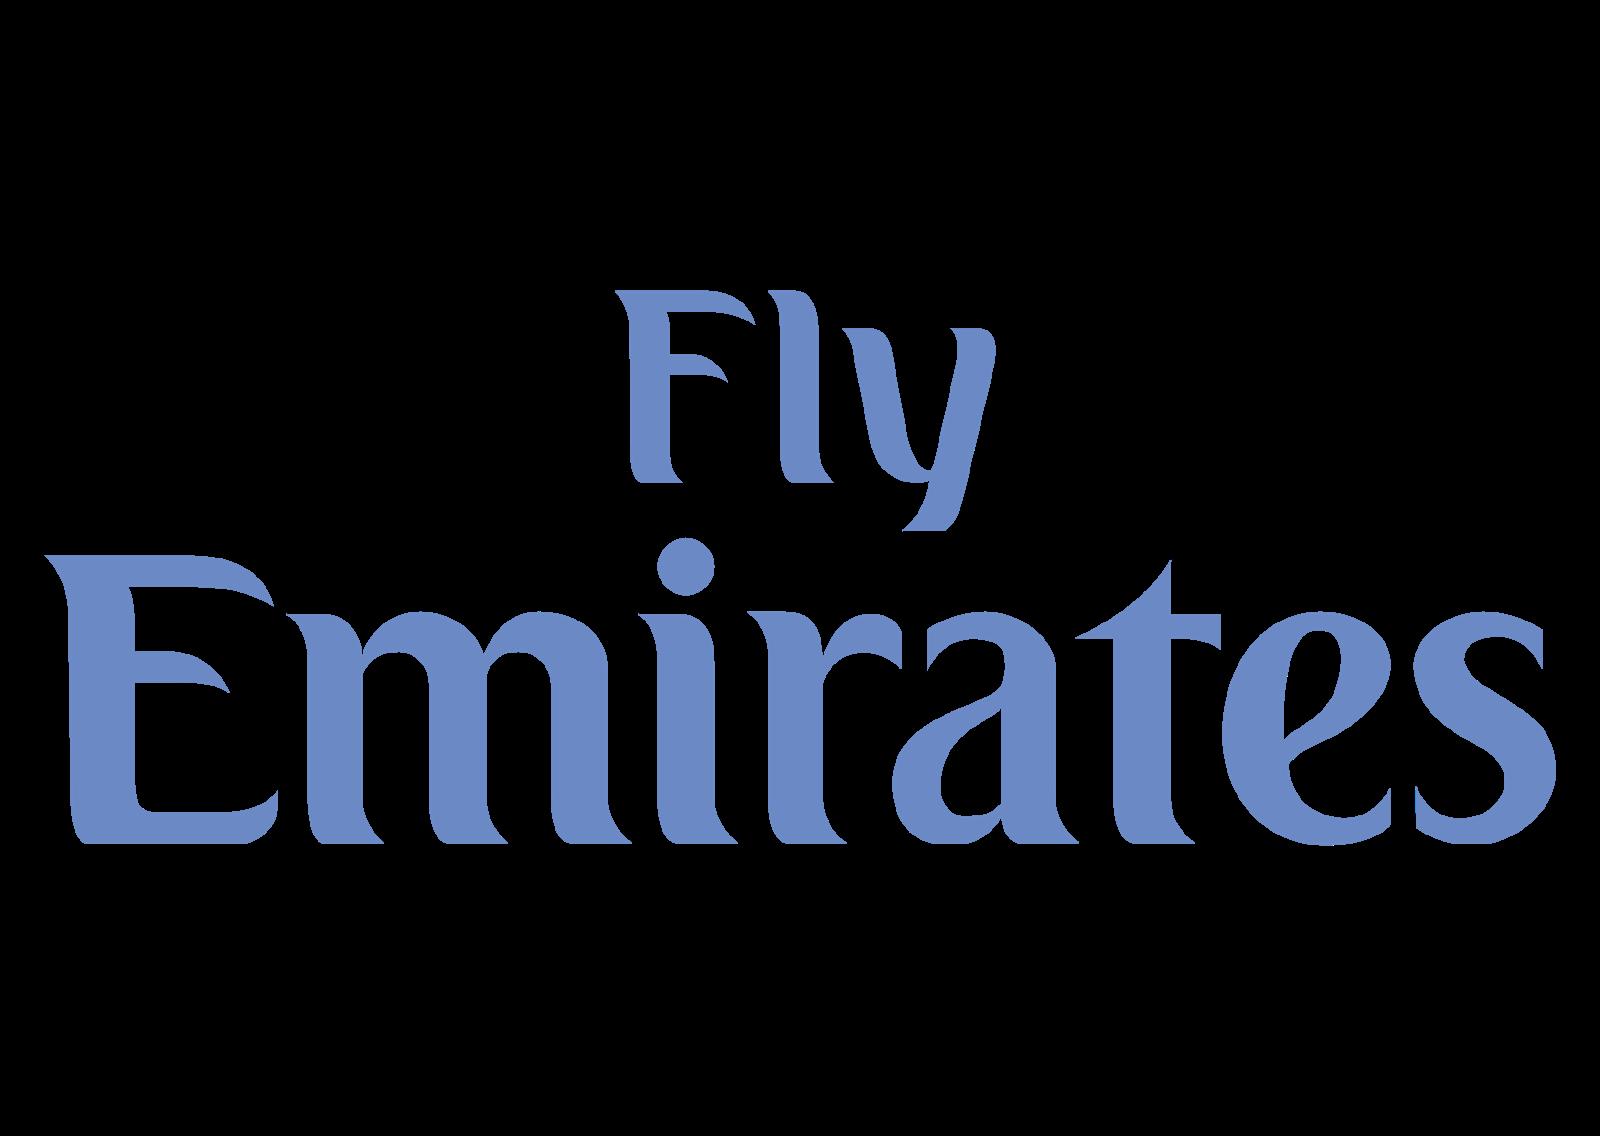 Fly Emirates Logo Wallpaper